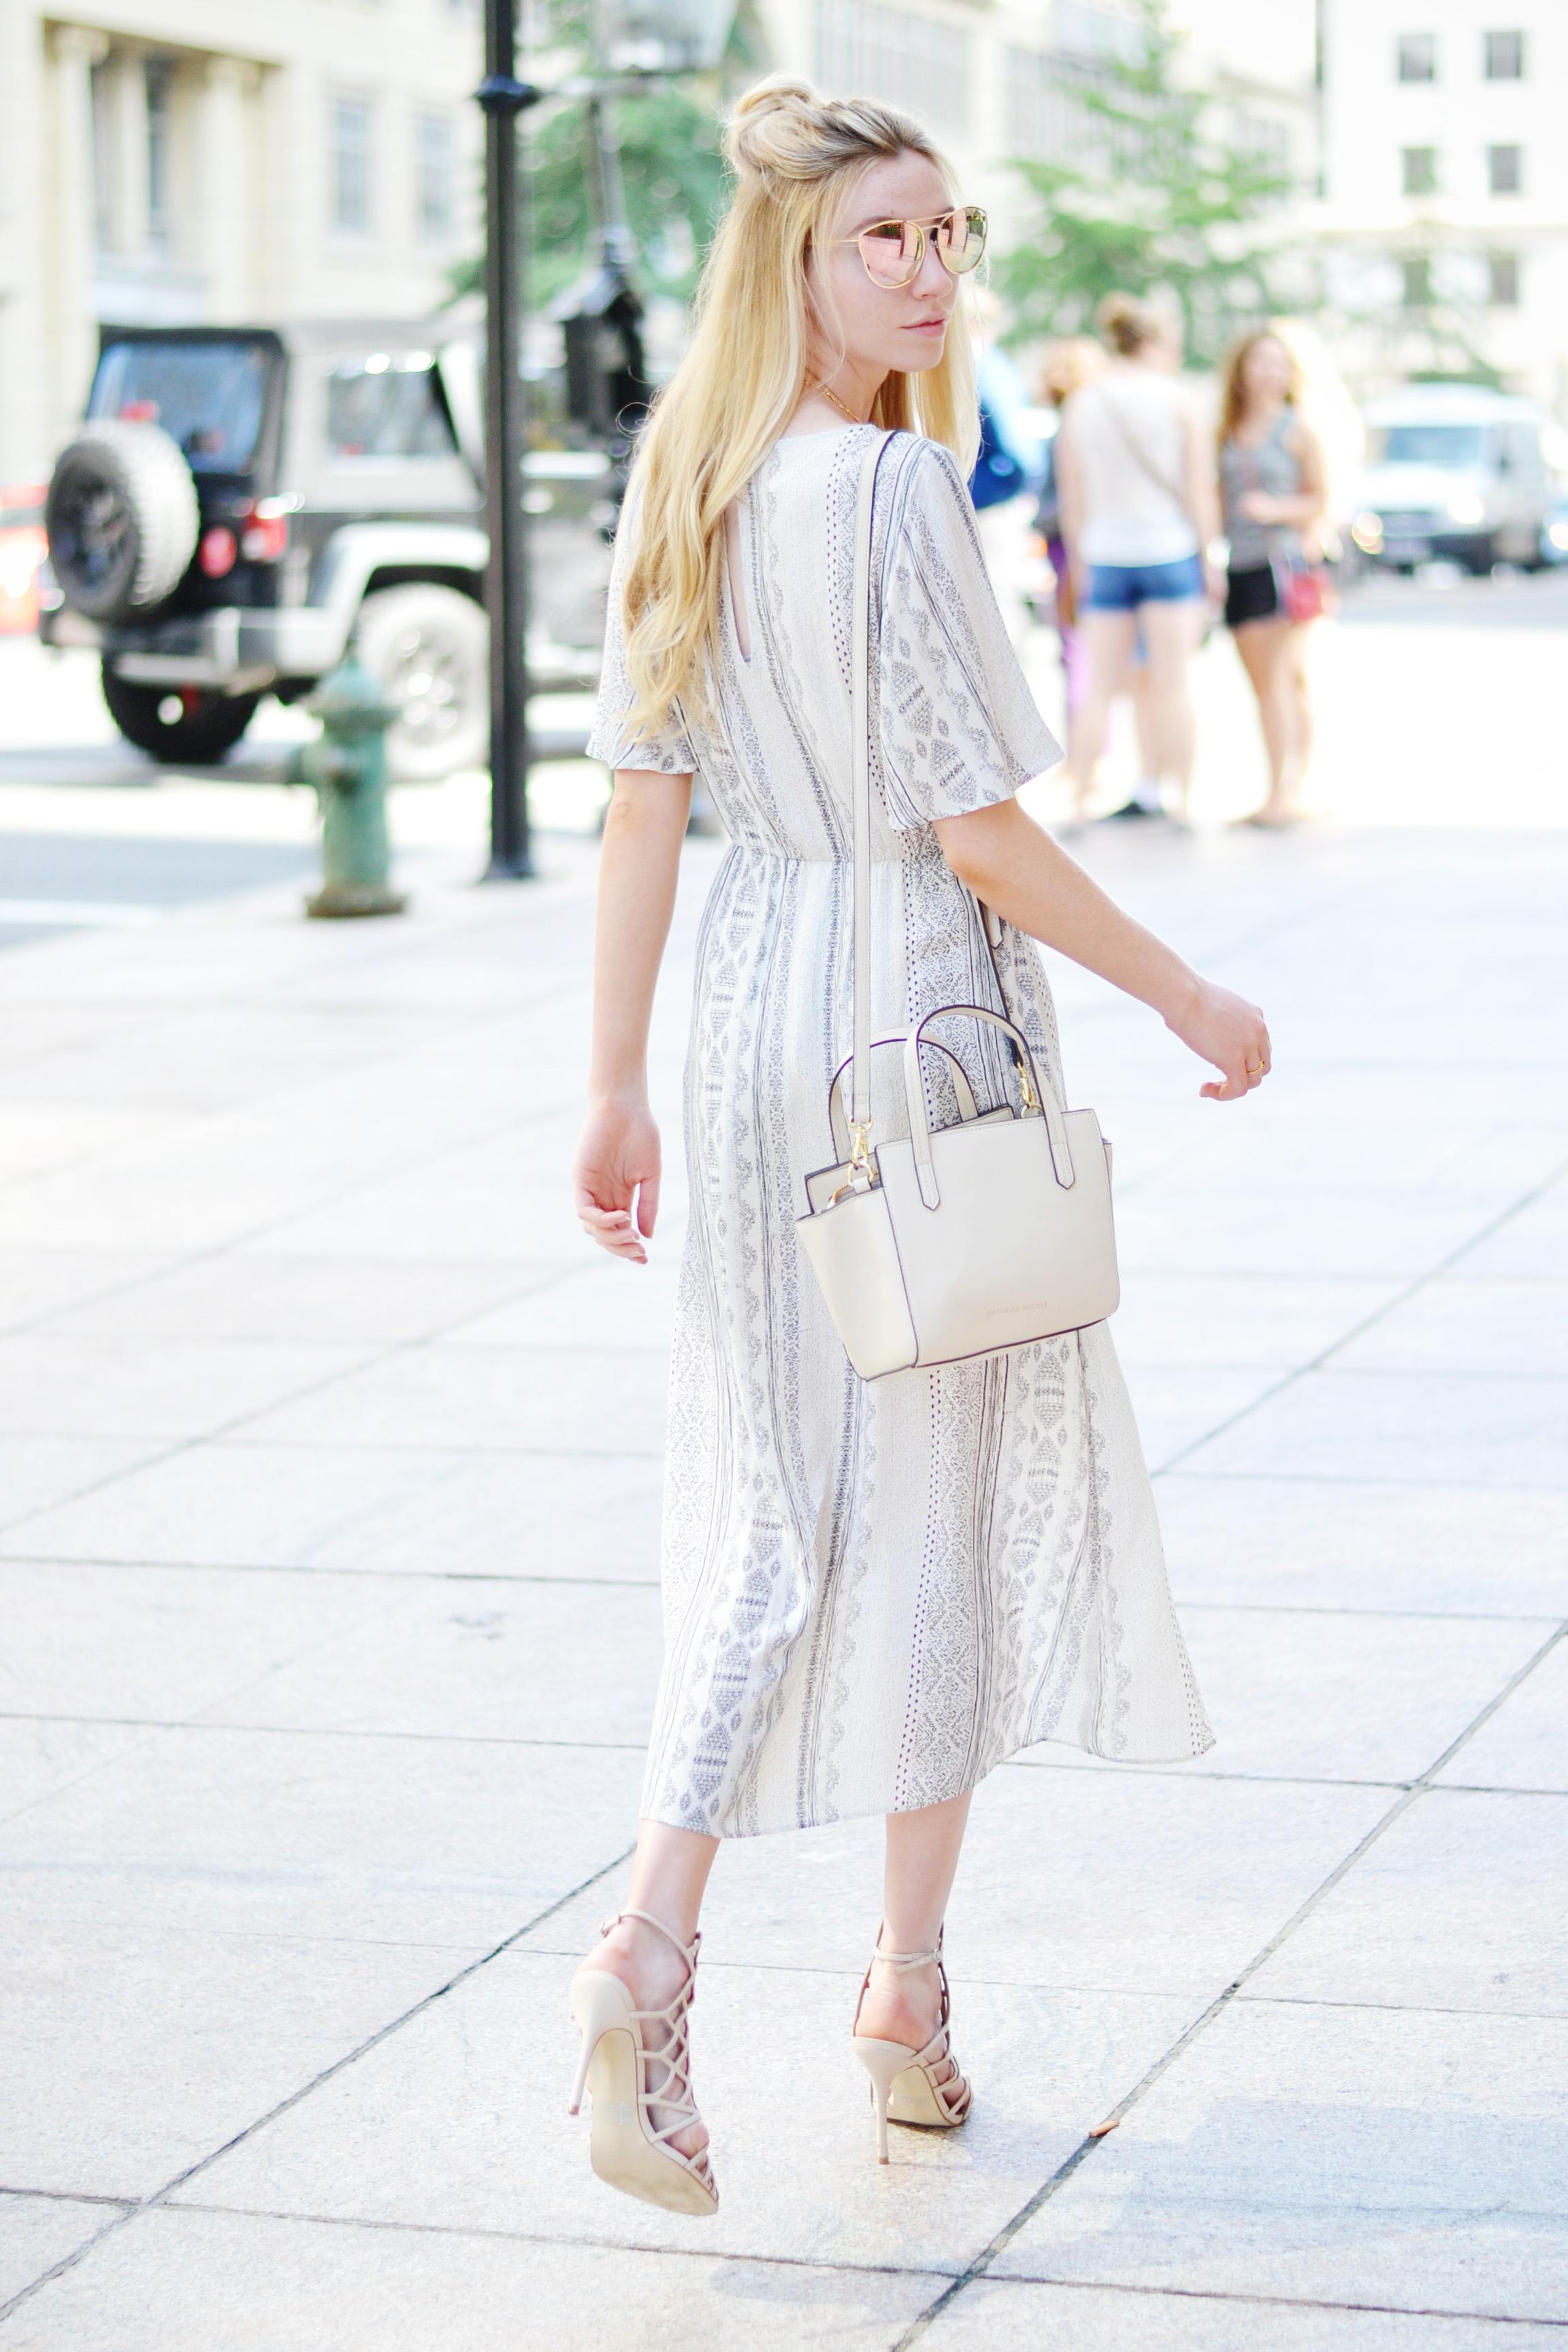 Blogger High Low Maxi Dress (via Chic Now)